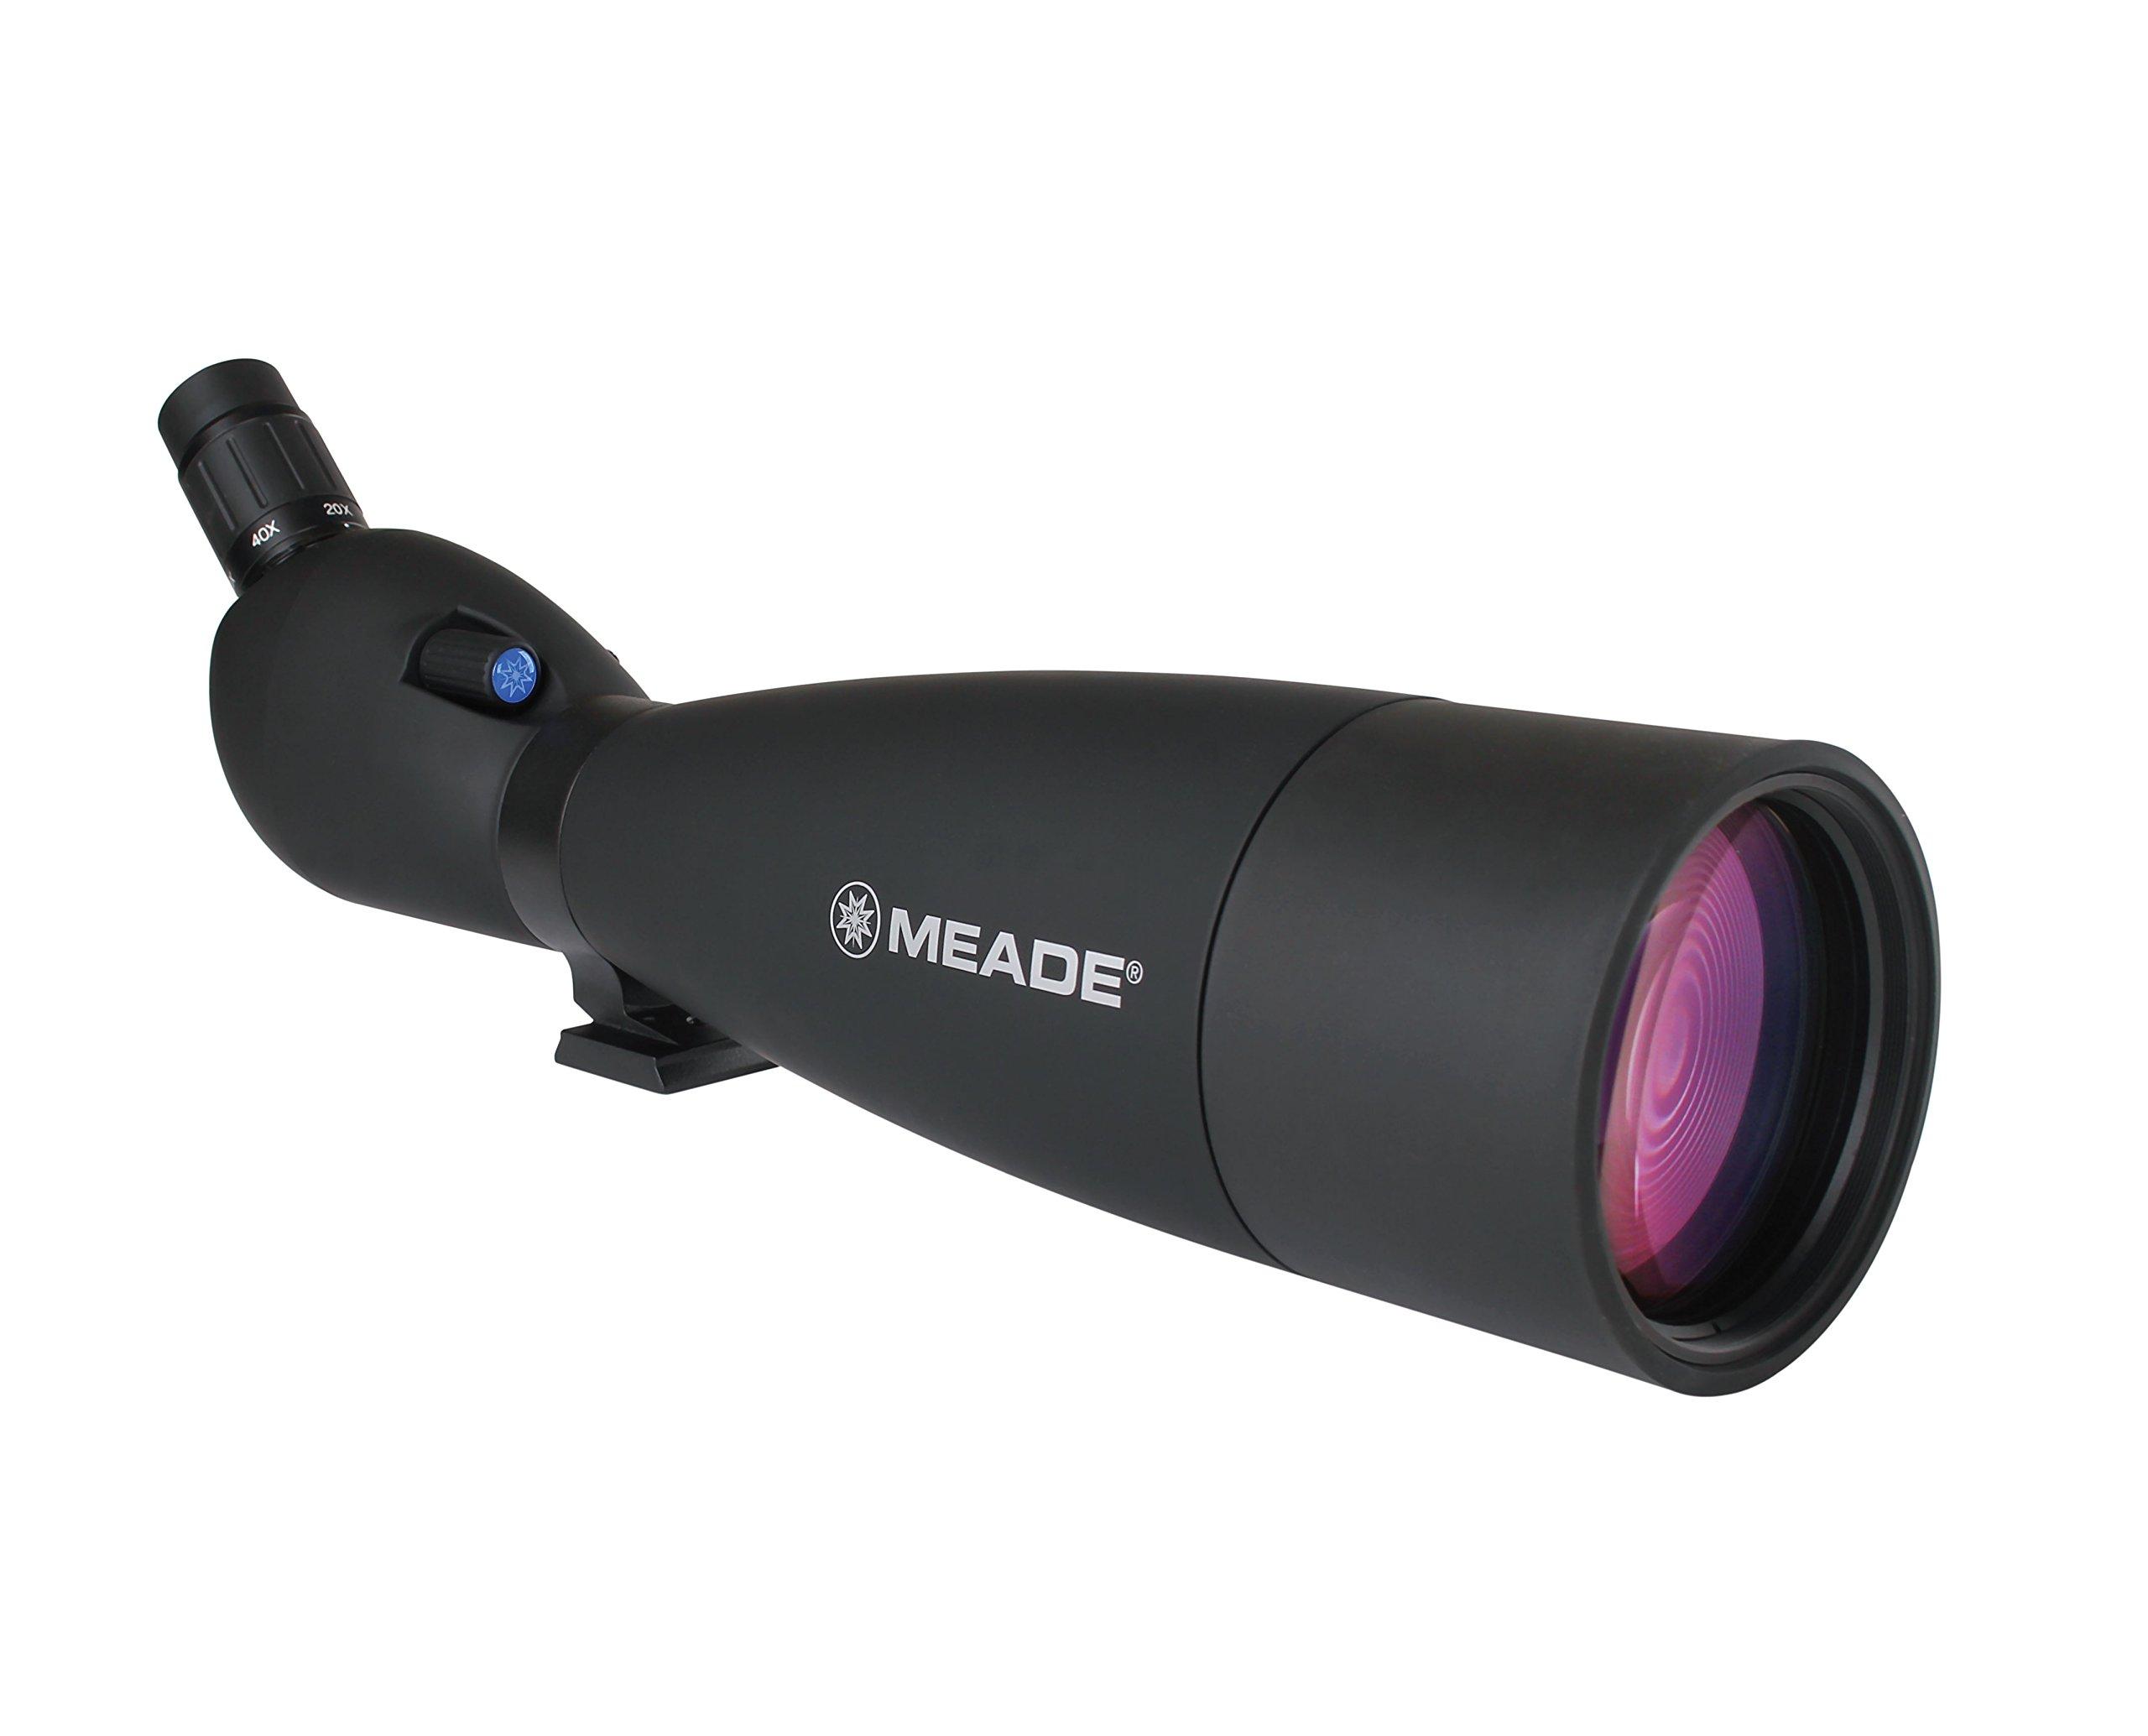 Meade Instruments 126002 Wilderness Spotting Scope - 20-60x100-mm (Black) by Meade Instruments